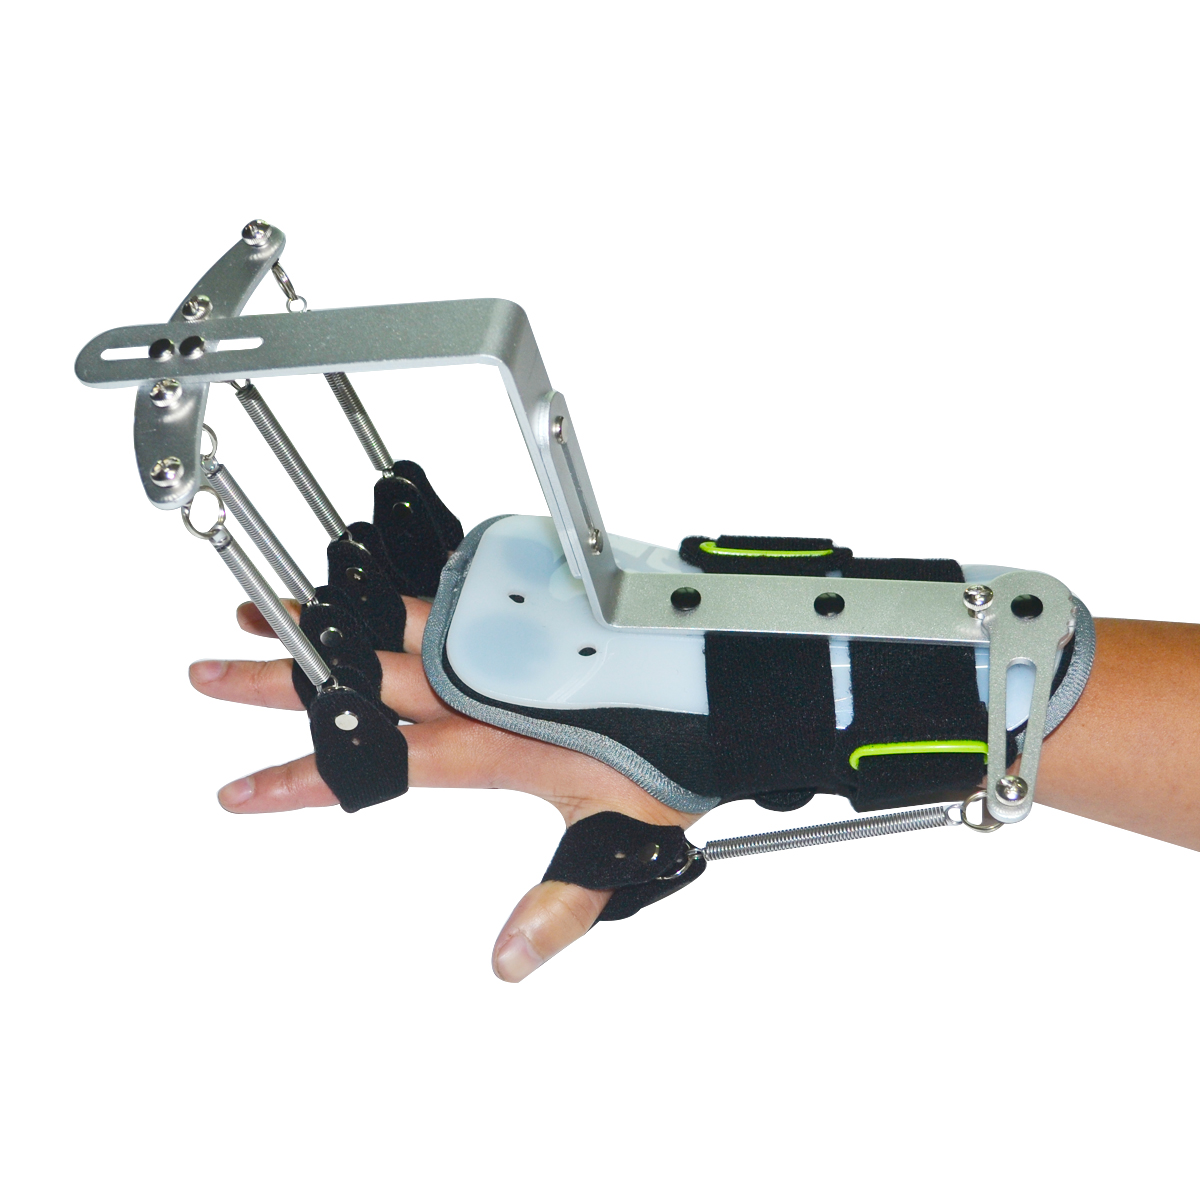 New Version Finger & Wrist Orthotics Exerciser Physiotherapy Rehabilitation Dynamic Wrist Support Brace For Hemiplegia Patien New Version Finger & Wrist Orthotics Exerciser Physiotherapy Rehabilitation Dynamic Wrist Support Brace For Hemiplegia Patien